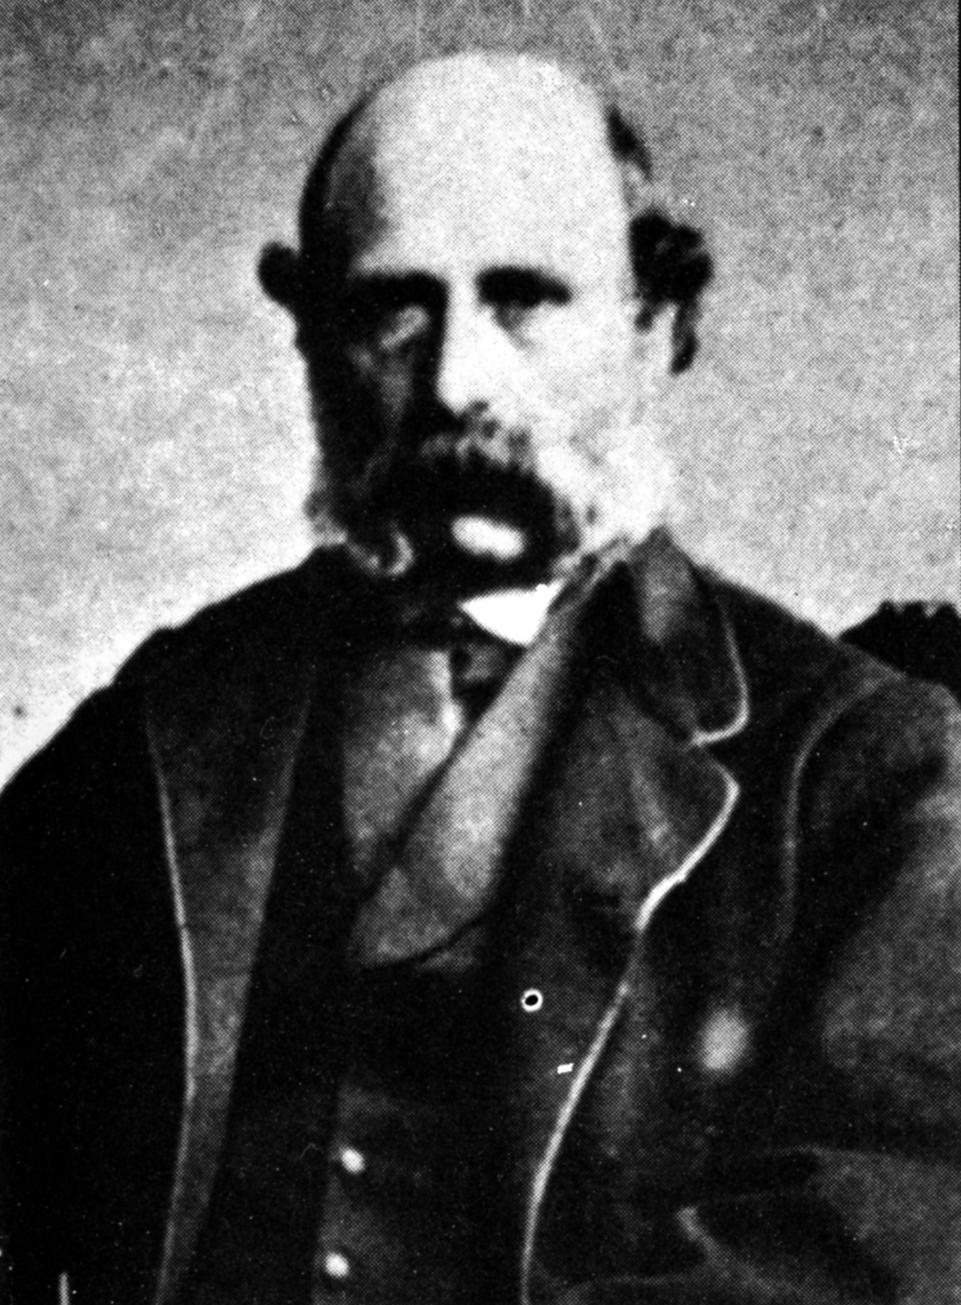 William King noel